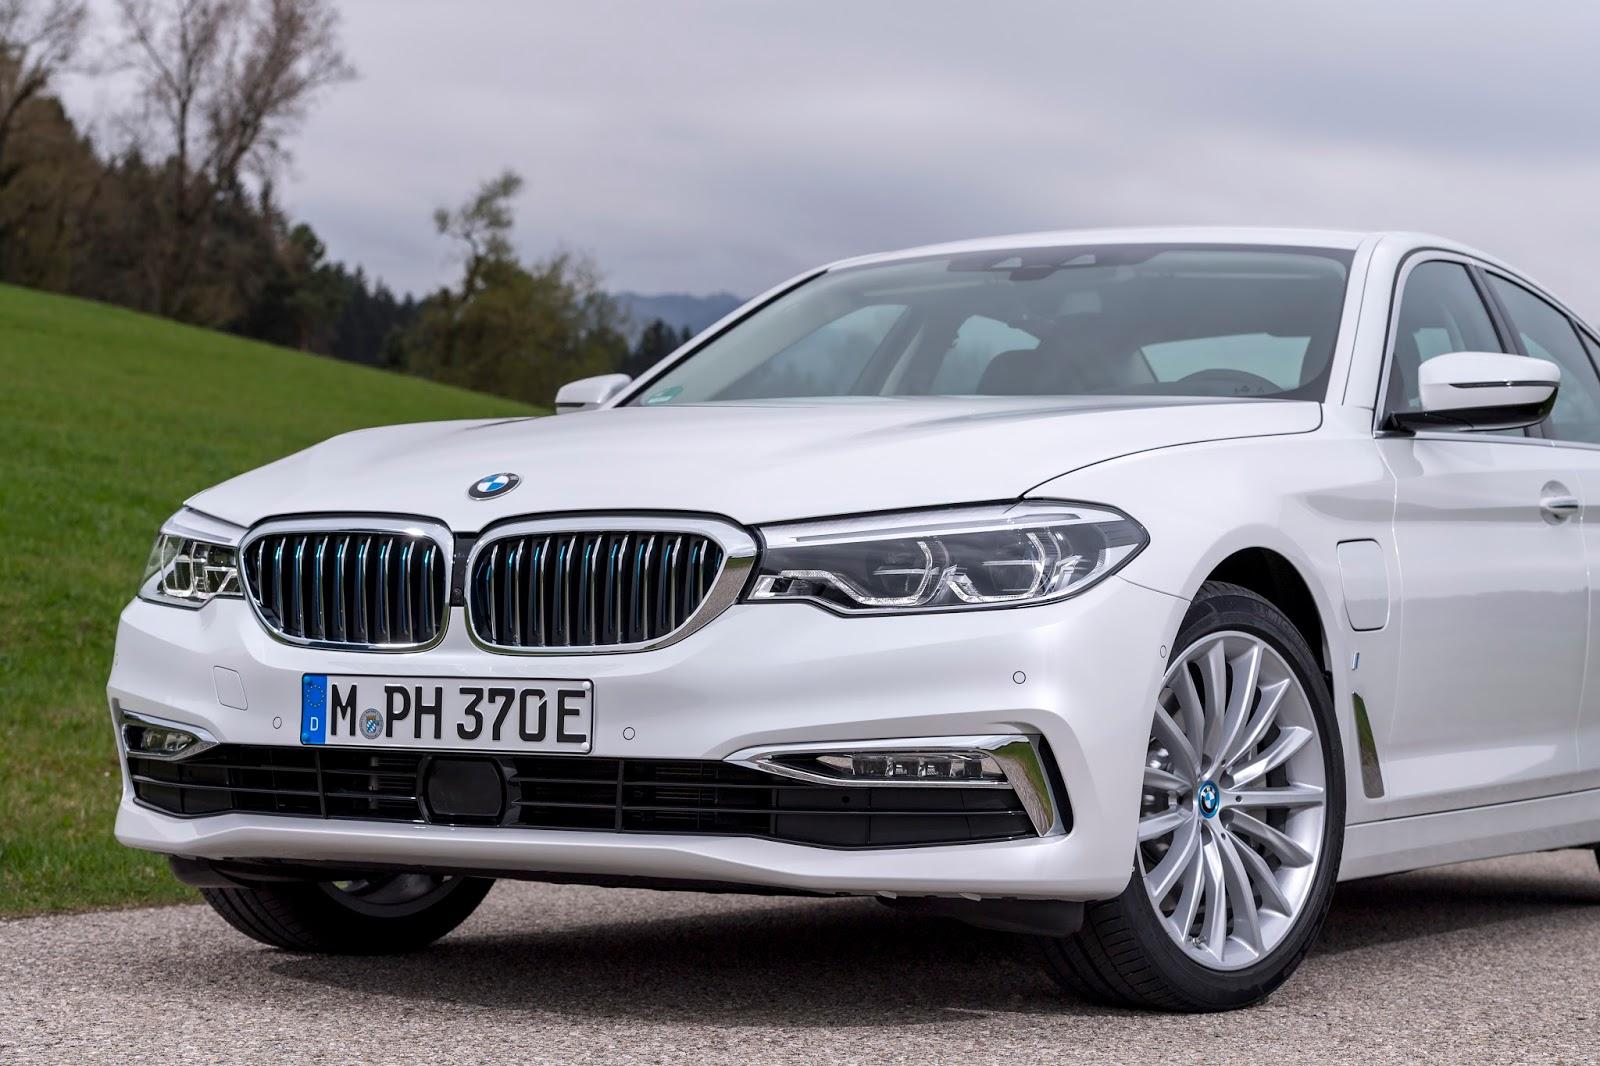 P90256372 highRes the new bmw 530e ipe Η BMW 530e iPerformance φέρνει την ηλεκτρική επανάσταση BMW, BMW 5, BMW 530e iPerformance, Electric cars, Hybrid, Λανσάρισμα